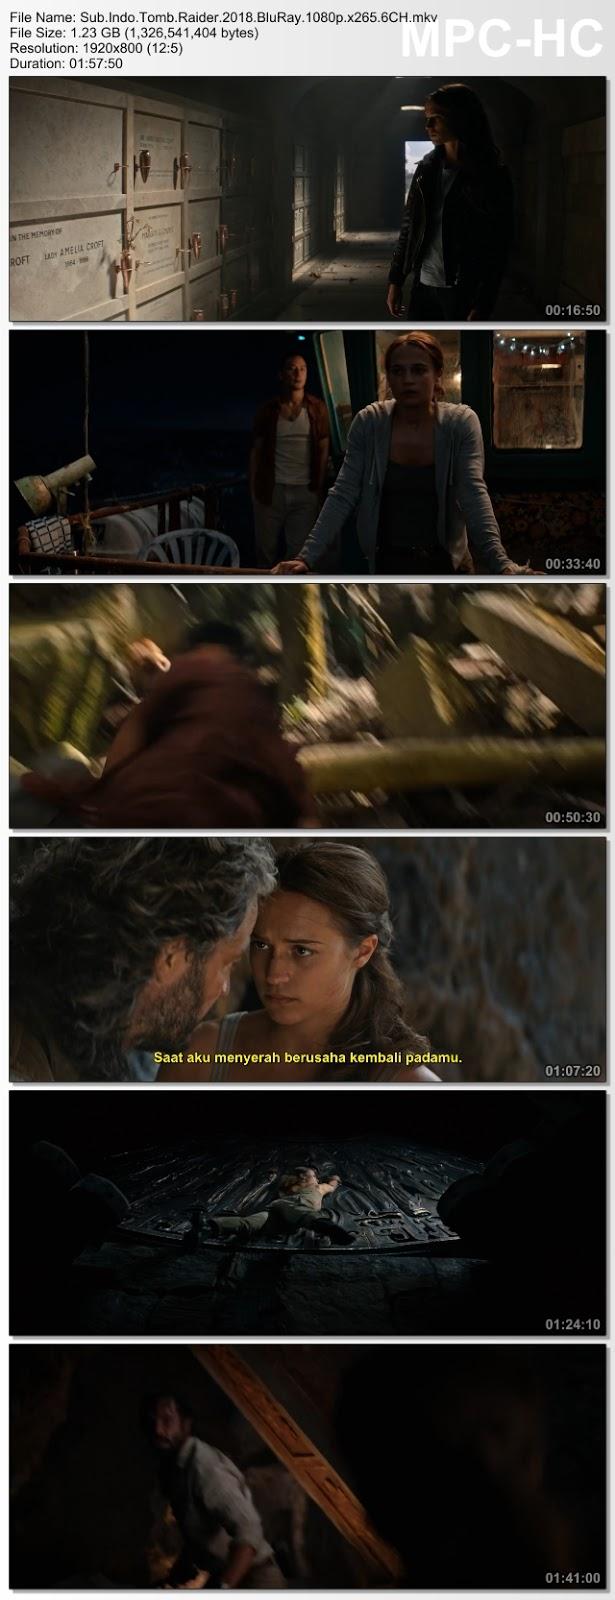 Screenshots Download Film Gratis Tomb Raider (2018) BluRay 480p MP4 Subtitle Bahasa Indonesia 3GP